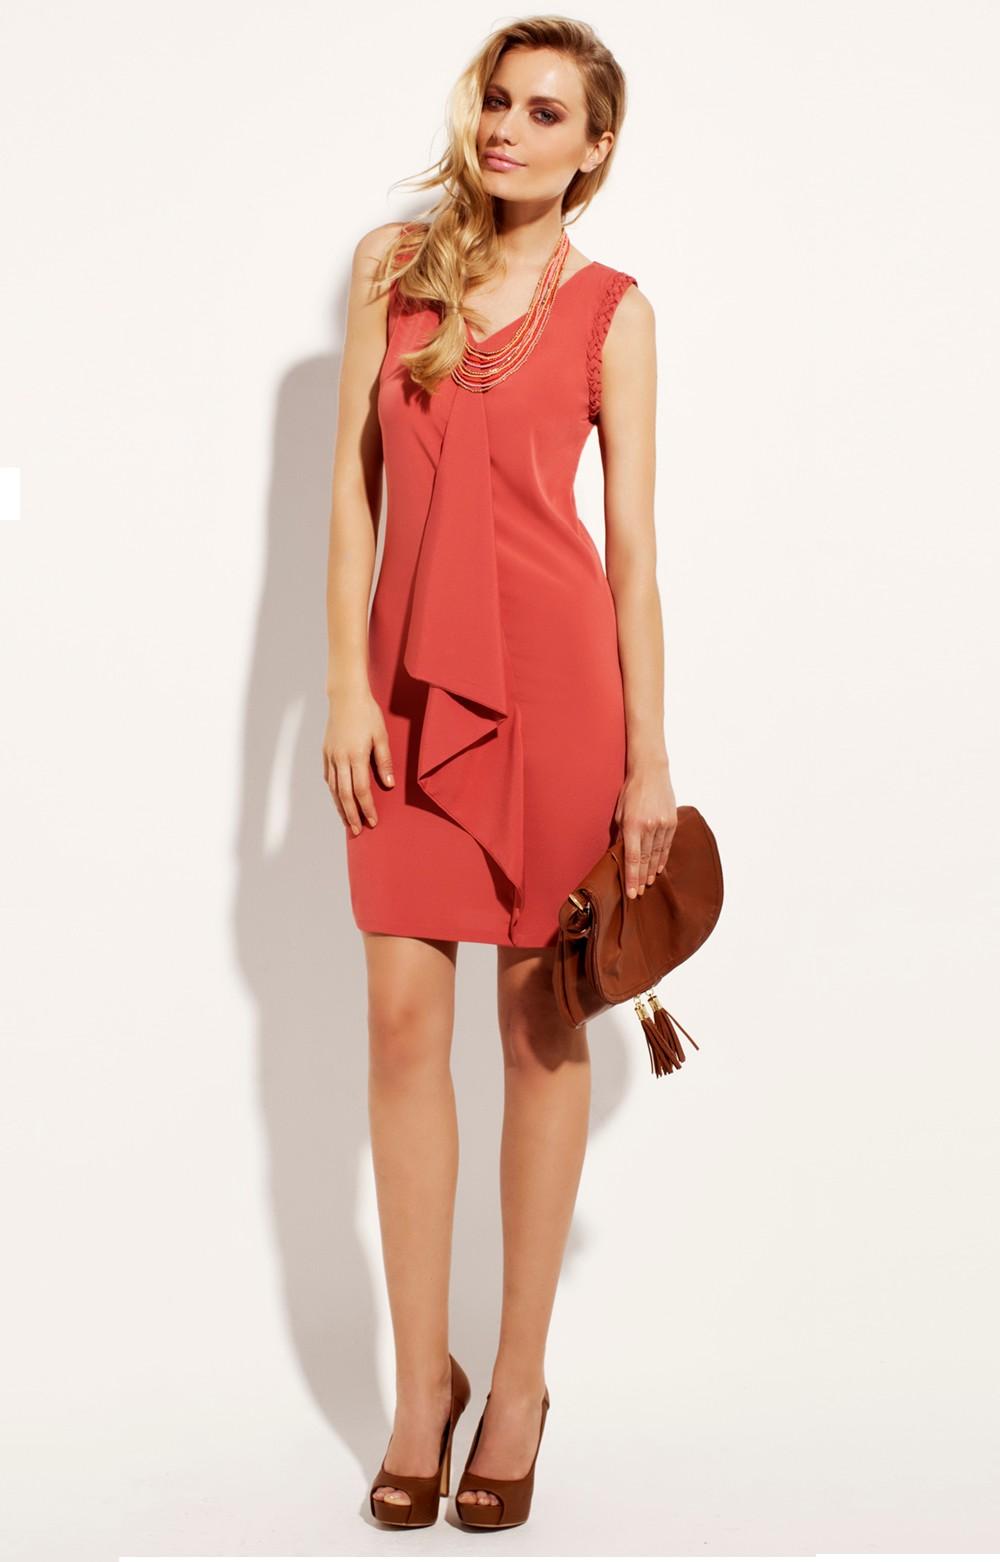 Acheter une robe corail en ligne